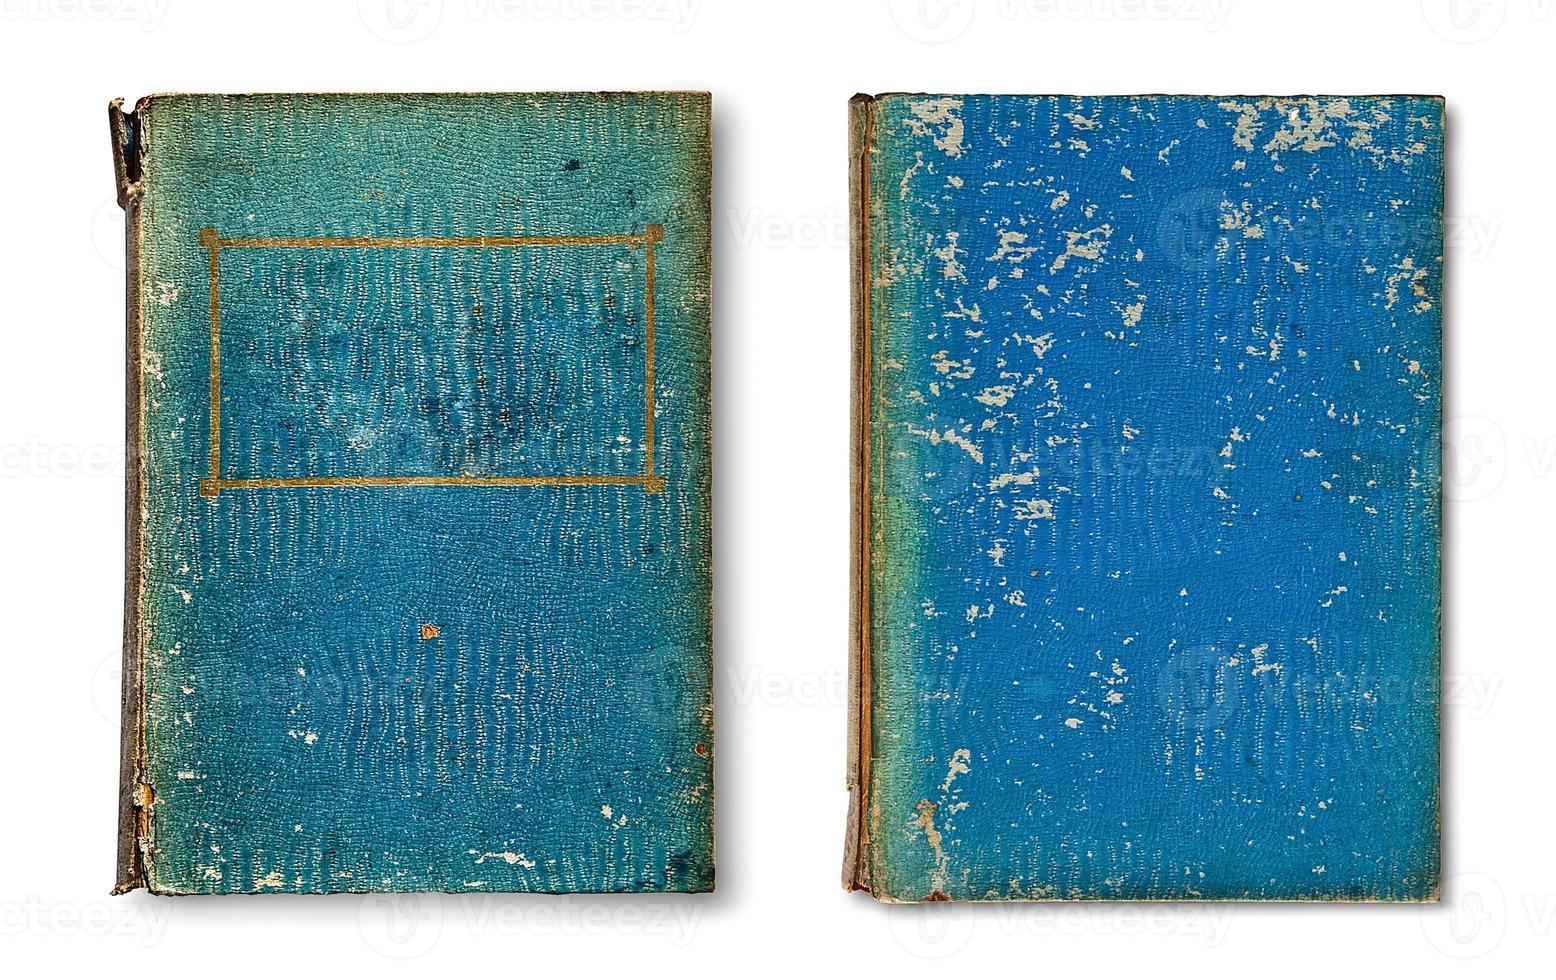 livro velho isolado no fundo branco foto